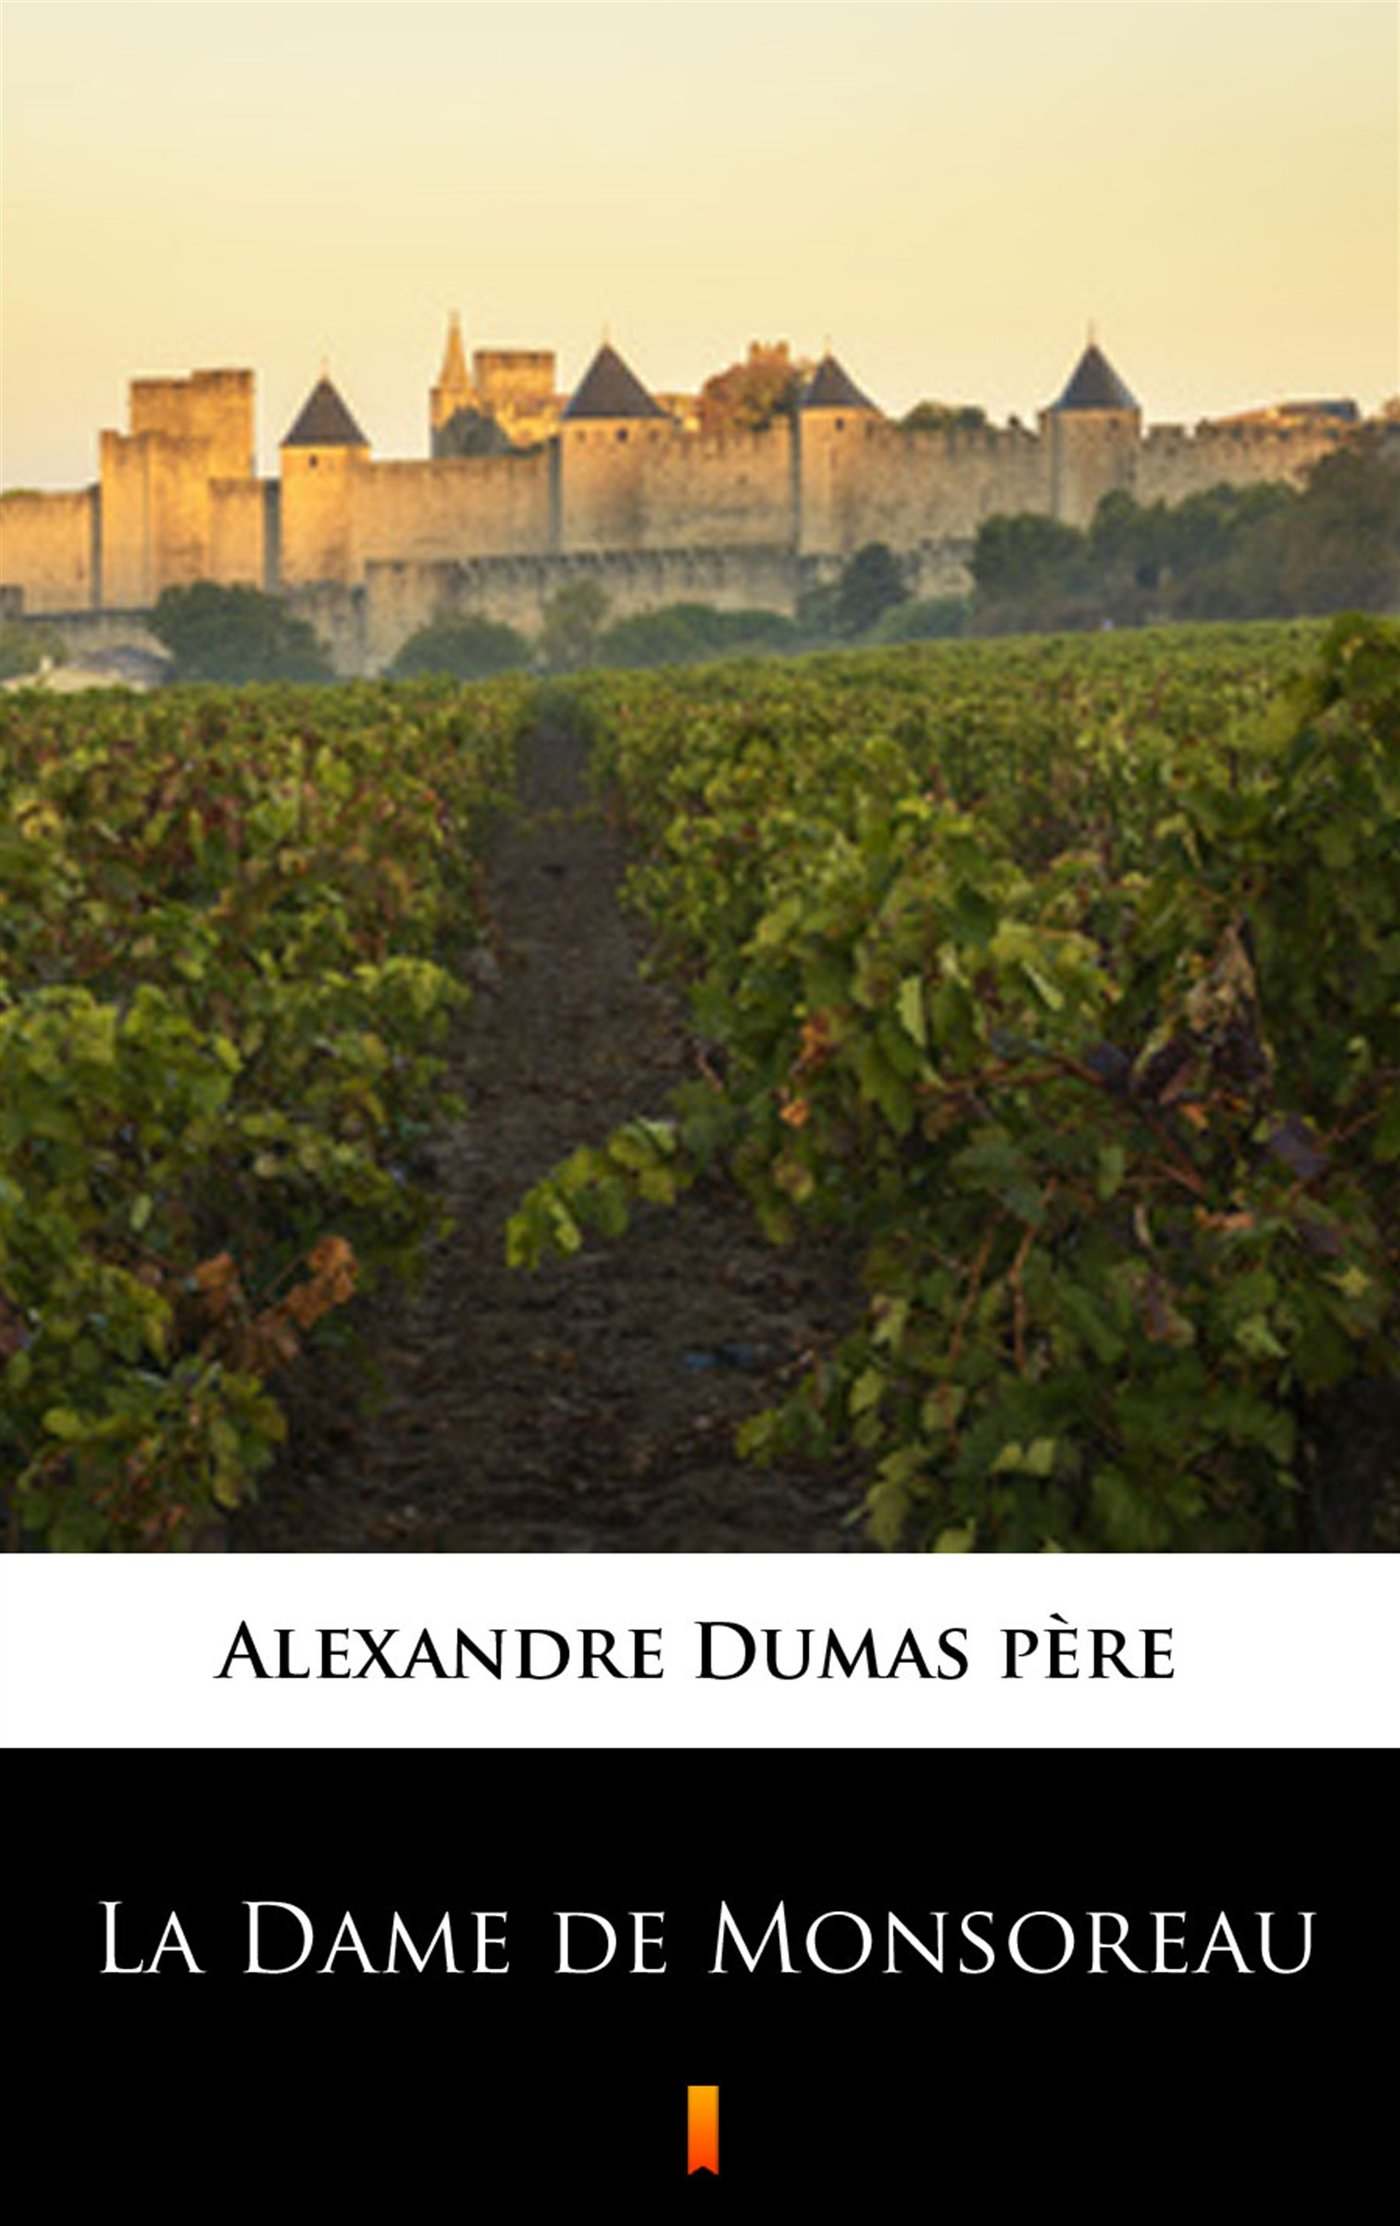 La Dame de Monsoreau - Ebook (Książka EPUB) do pobrania w formacie EPUB